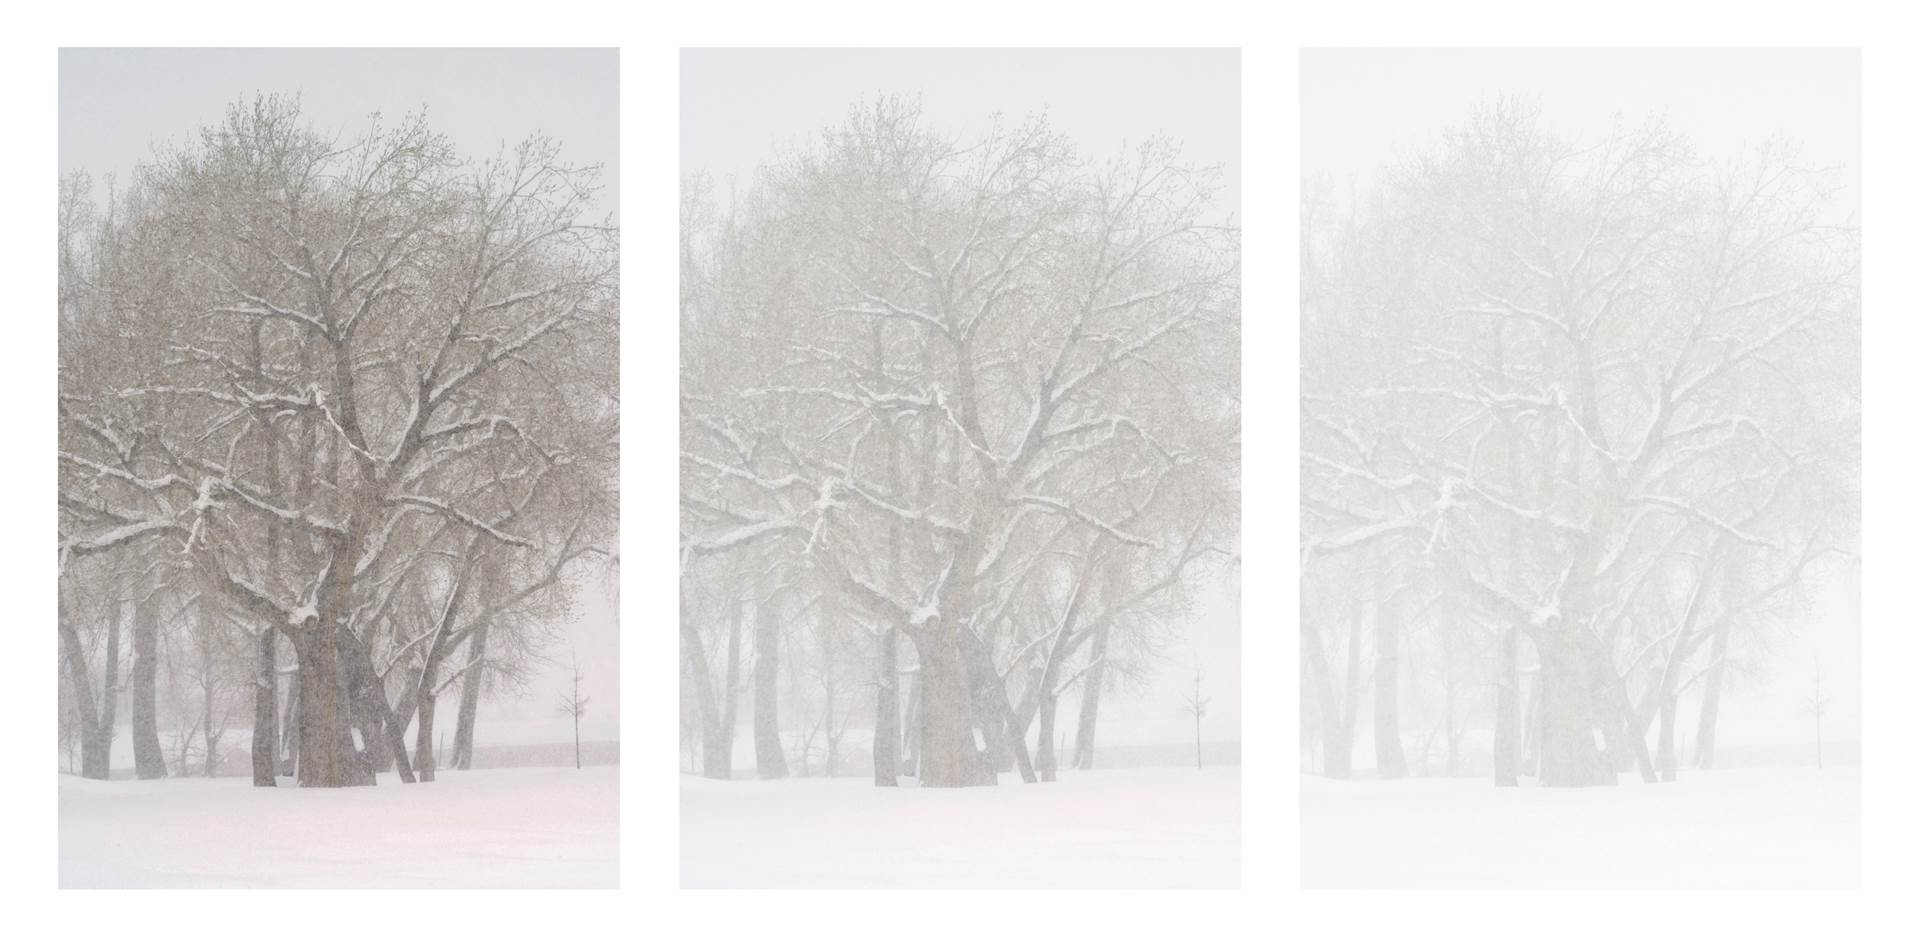 Bo Cheatham. North Shore Flurry . Triptych. Color Digital Photography. 16.5